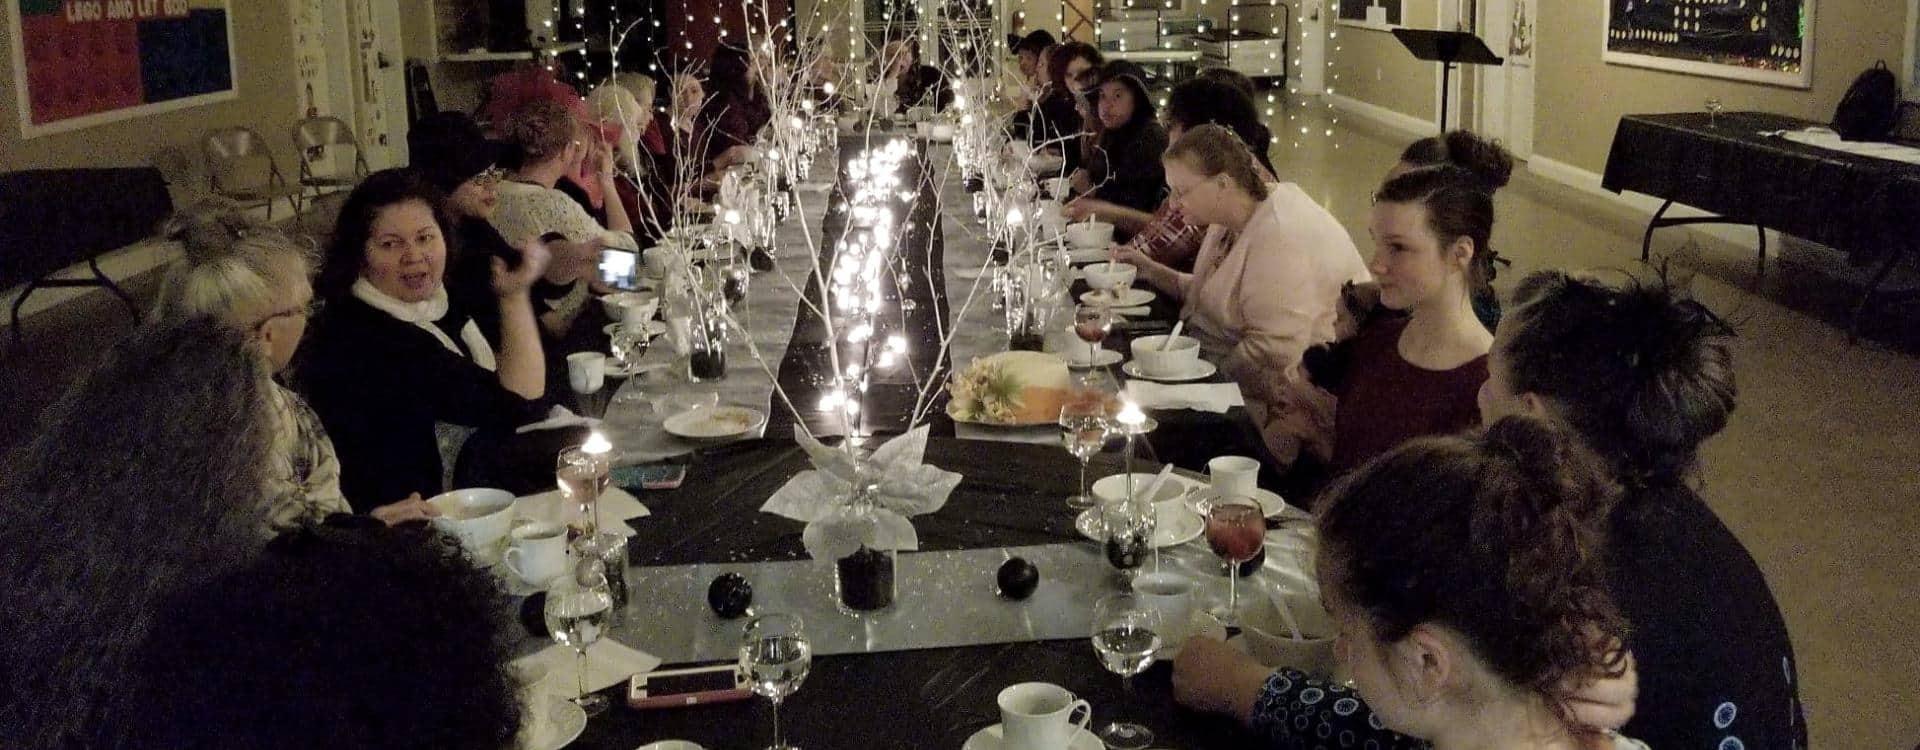 ladies christmas tea in ellsworth maine